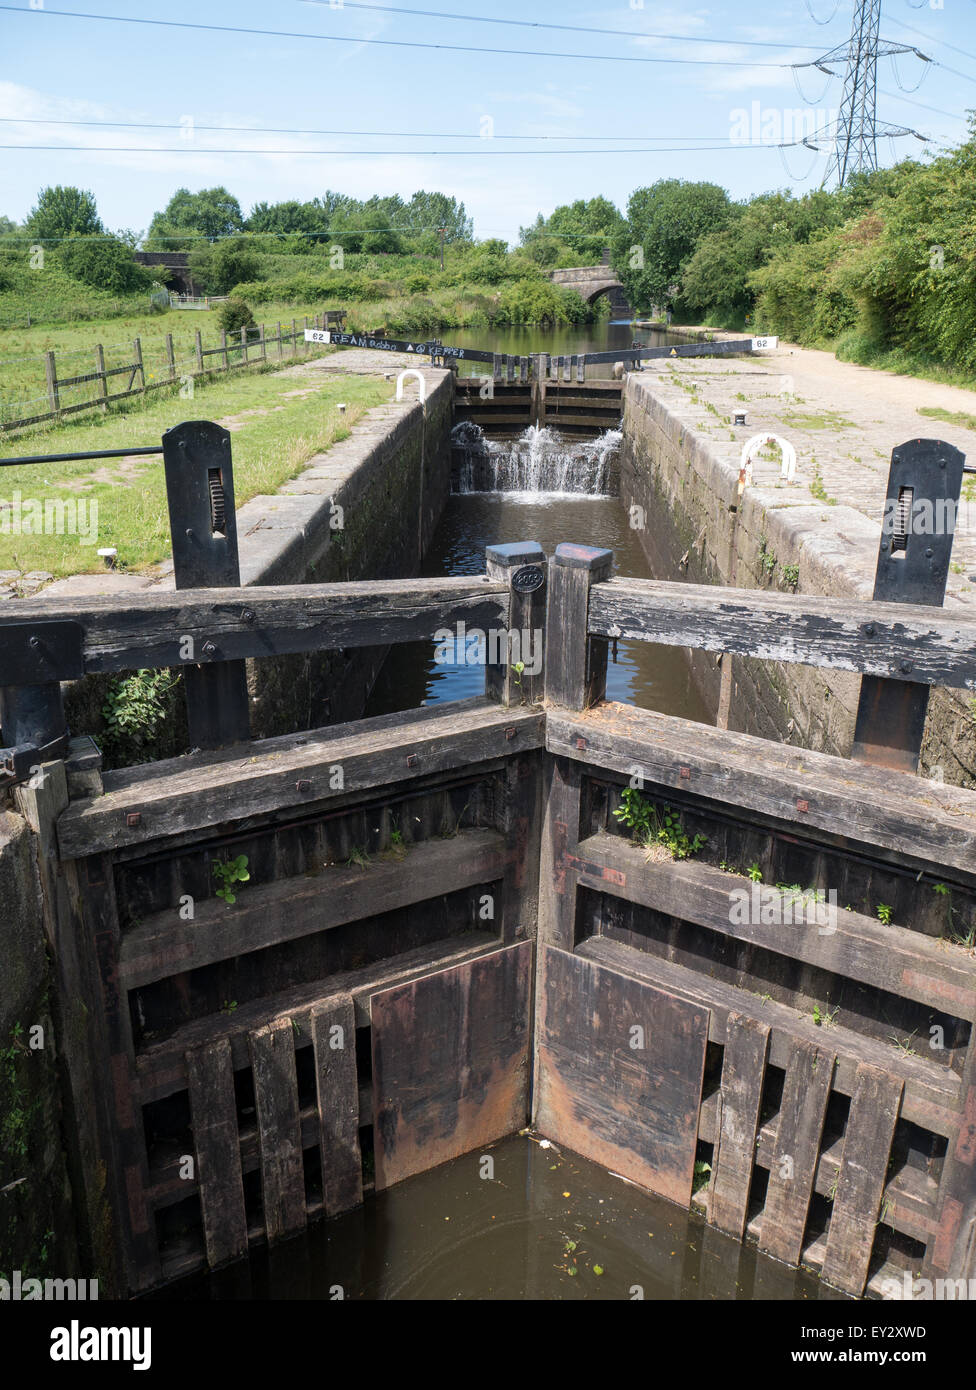 Lock gates on Rochdale Canal near Oldham, Lancashire - Stock Image